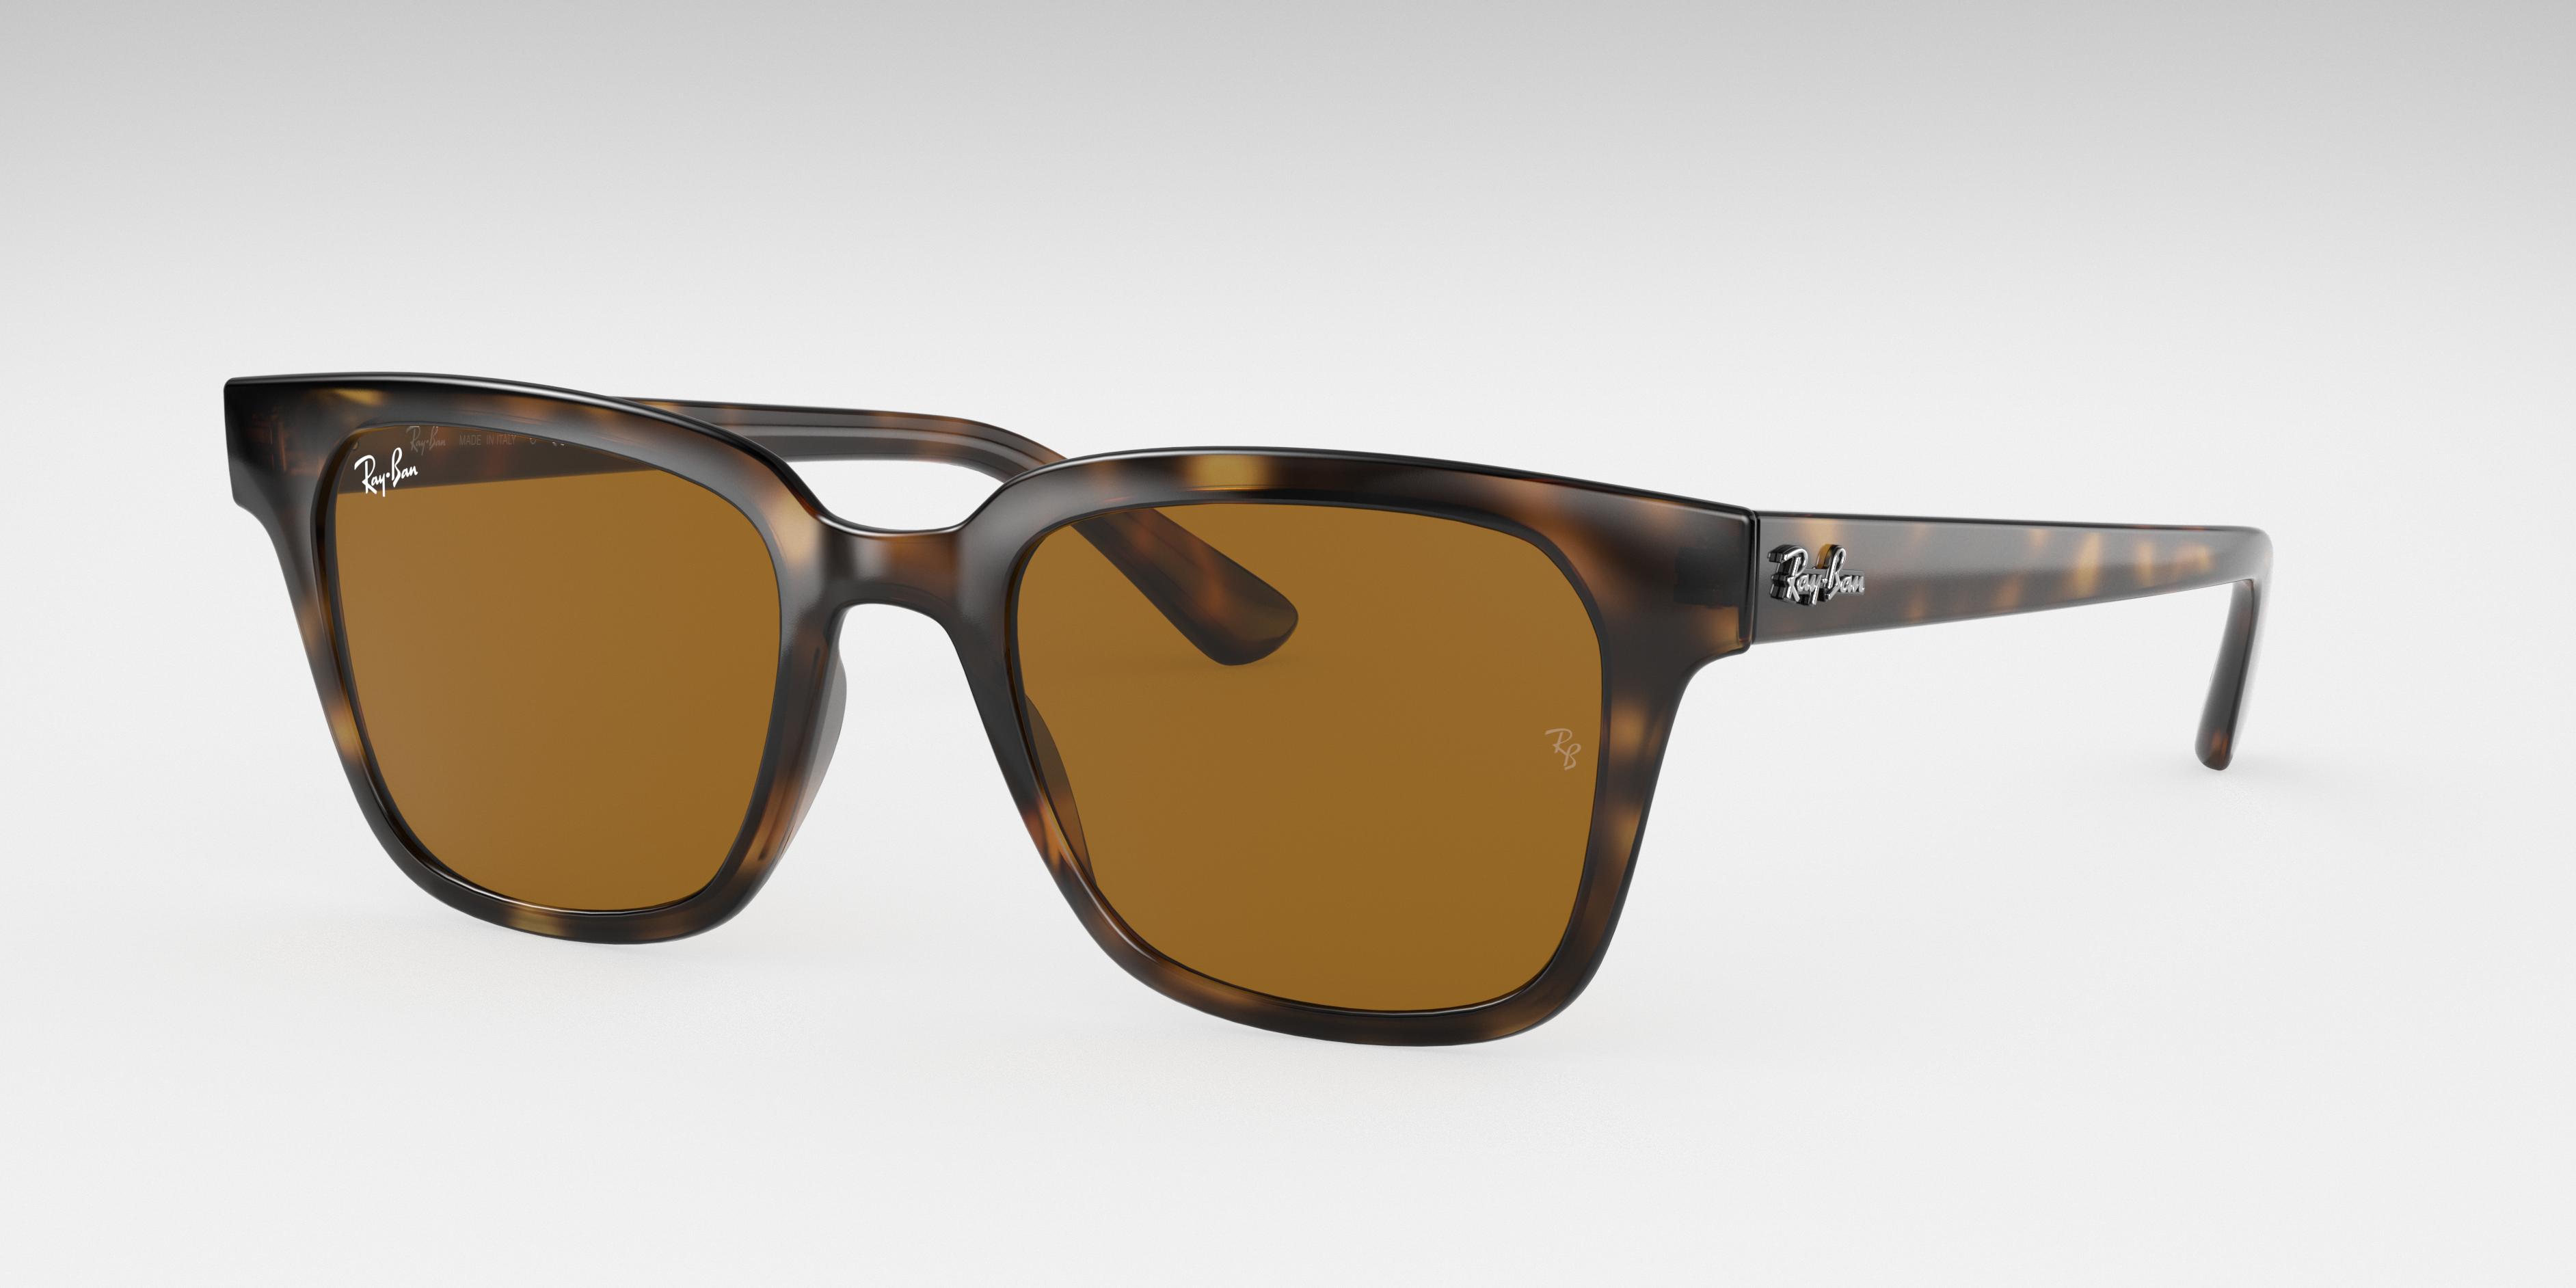 Ray-Ban Rb4323 Tortoise, Brown Lenses - RB4323